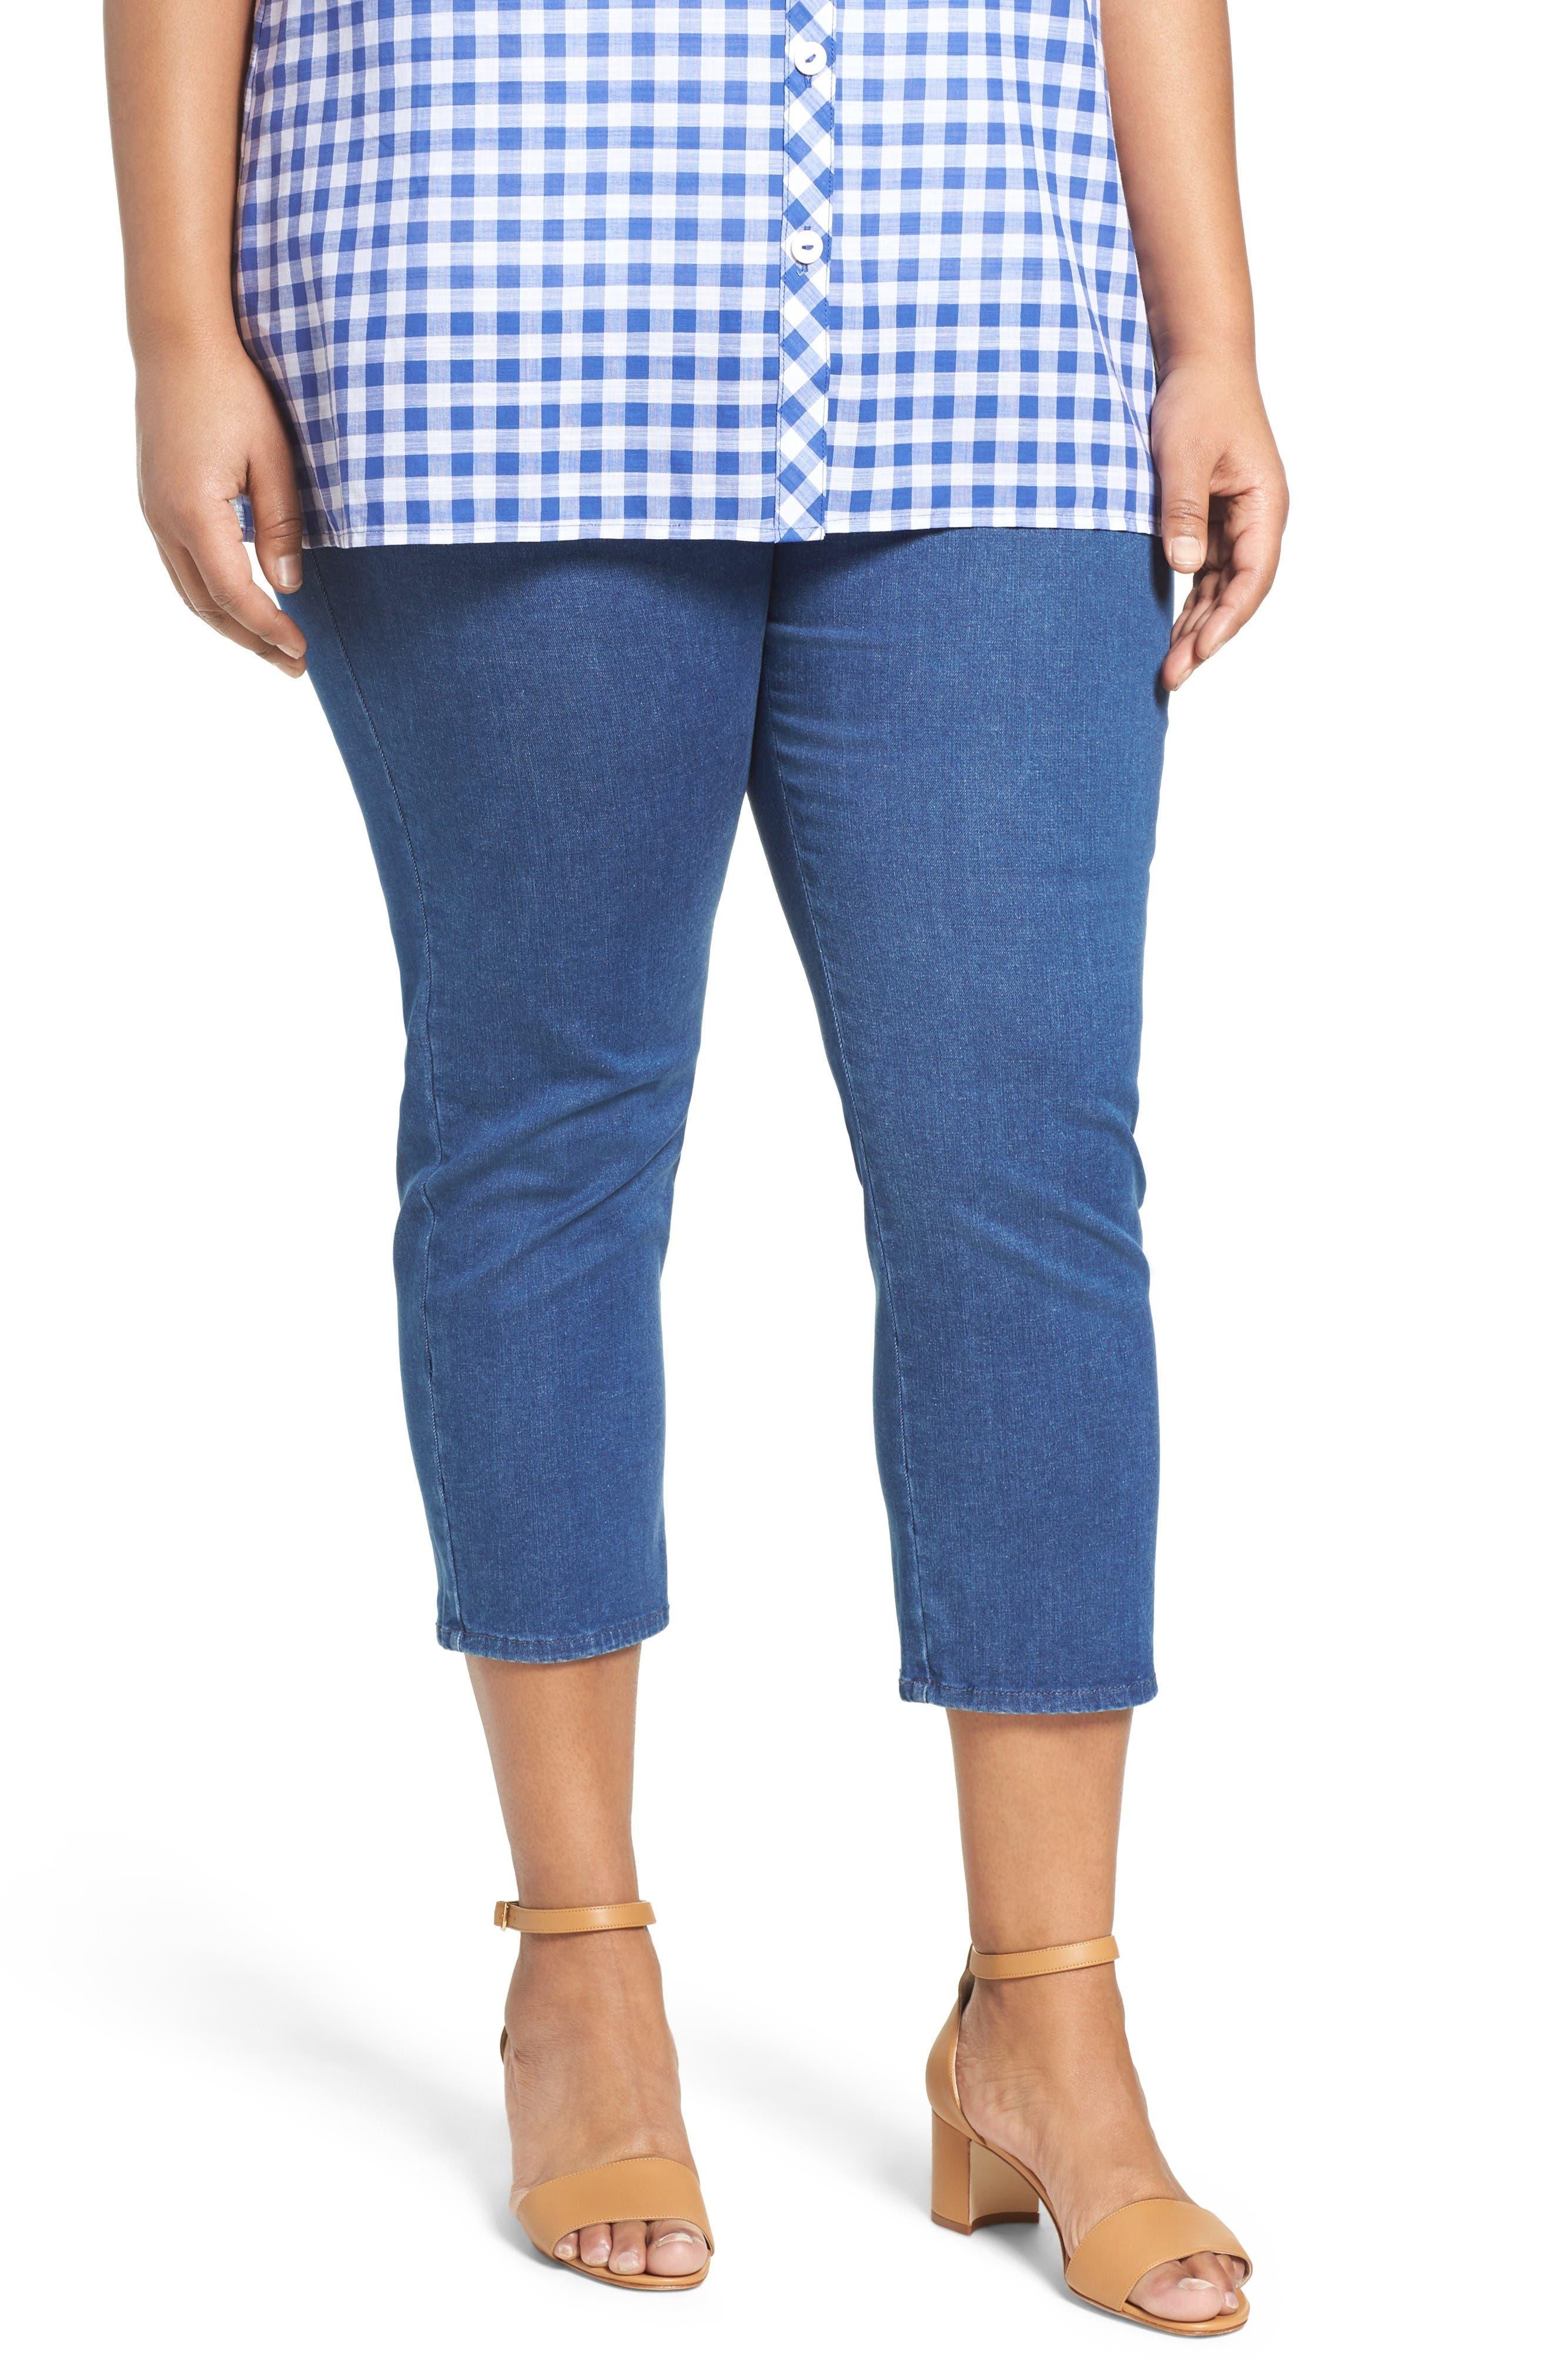 Main Image - Foxcroft Nina Slimming Pull-On Capri Jeans (Plus Size)